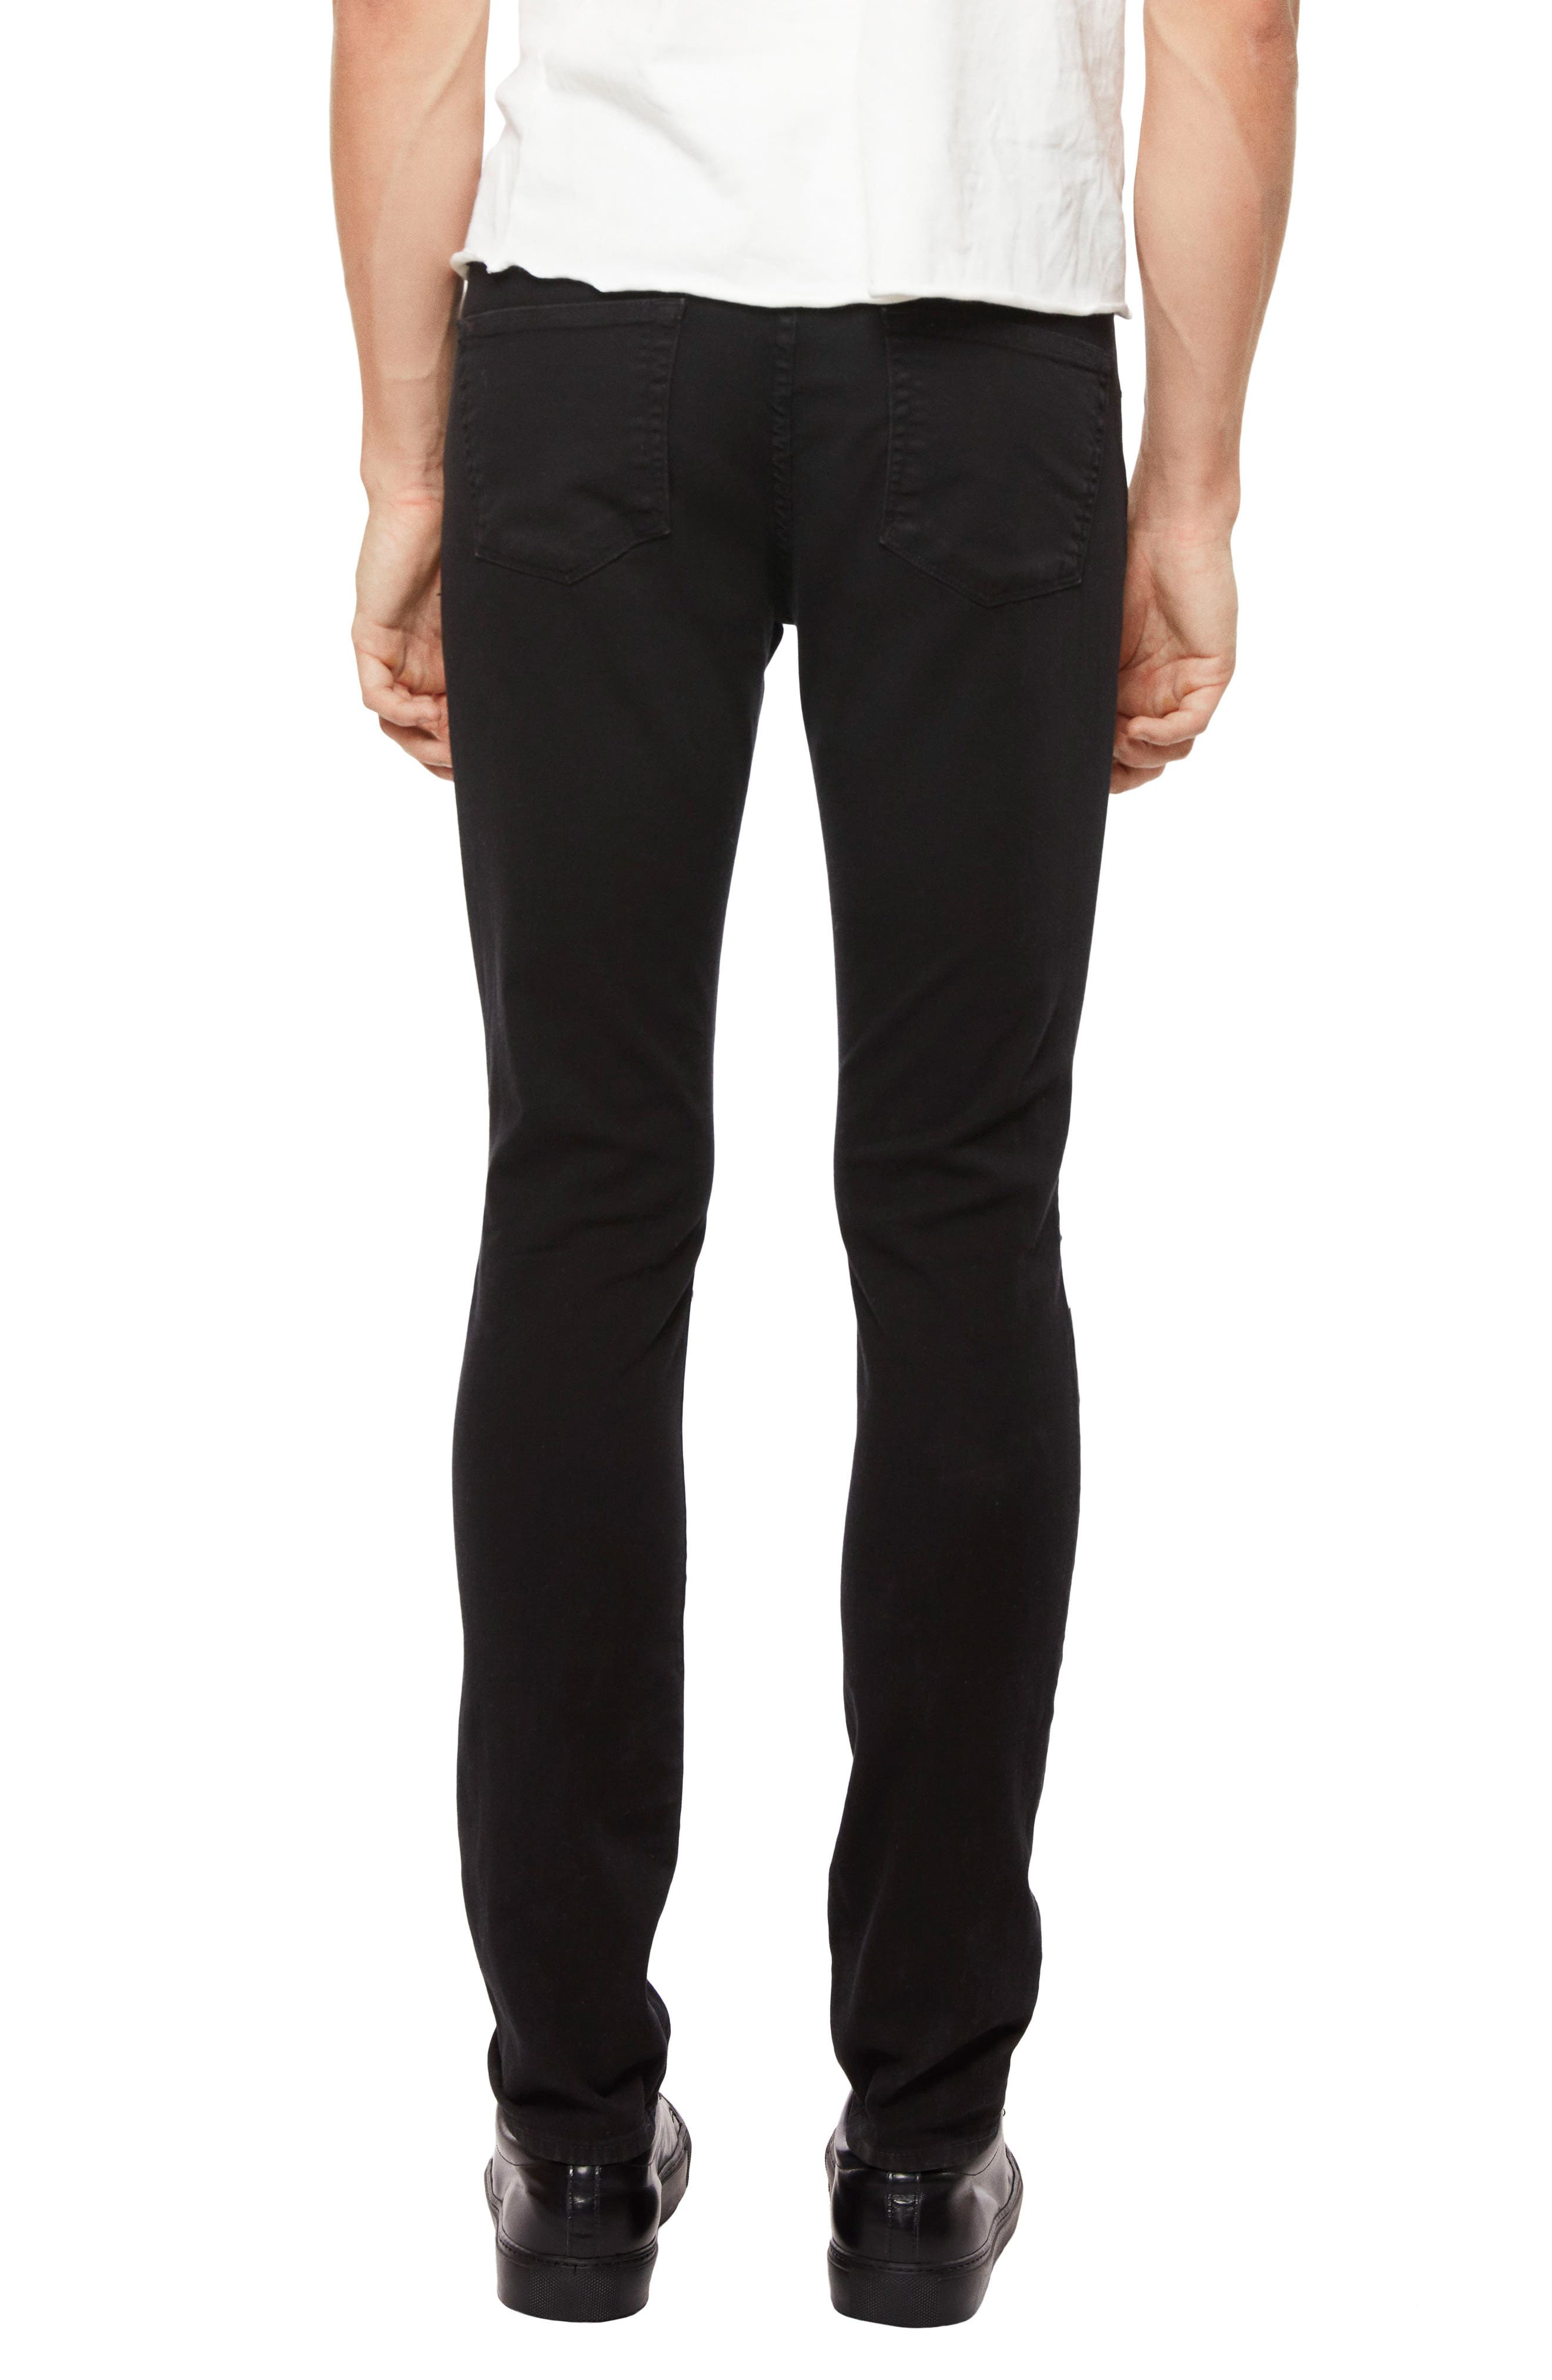 Mick Skinny Fit Jeans,                             Alternate thumbnail 2, color,                             LINCOLN OAK